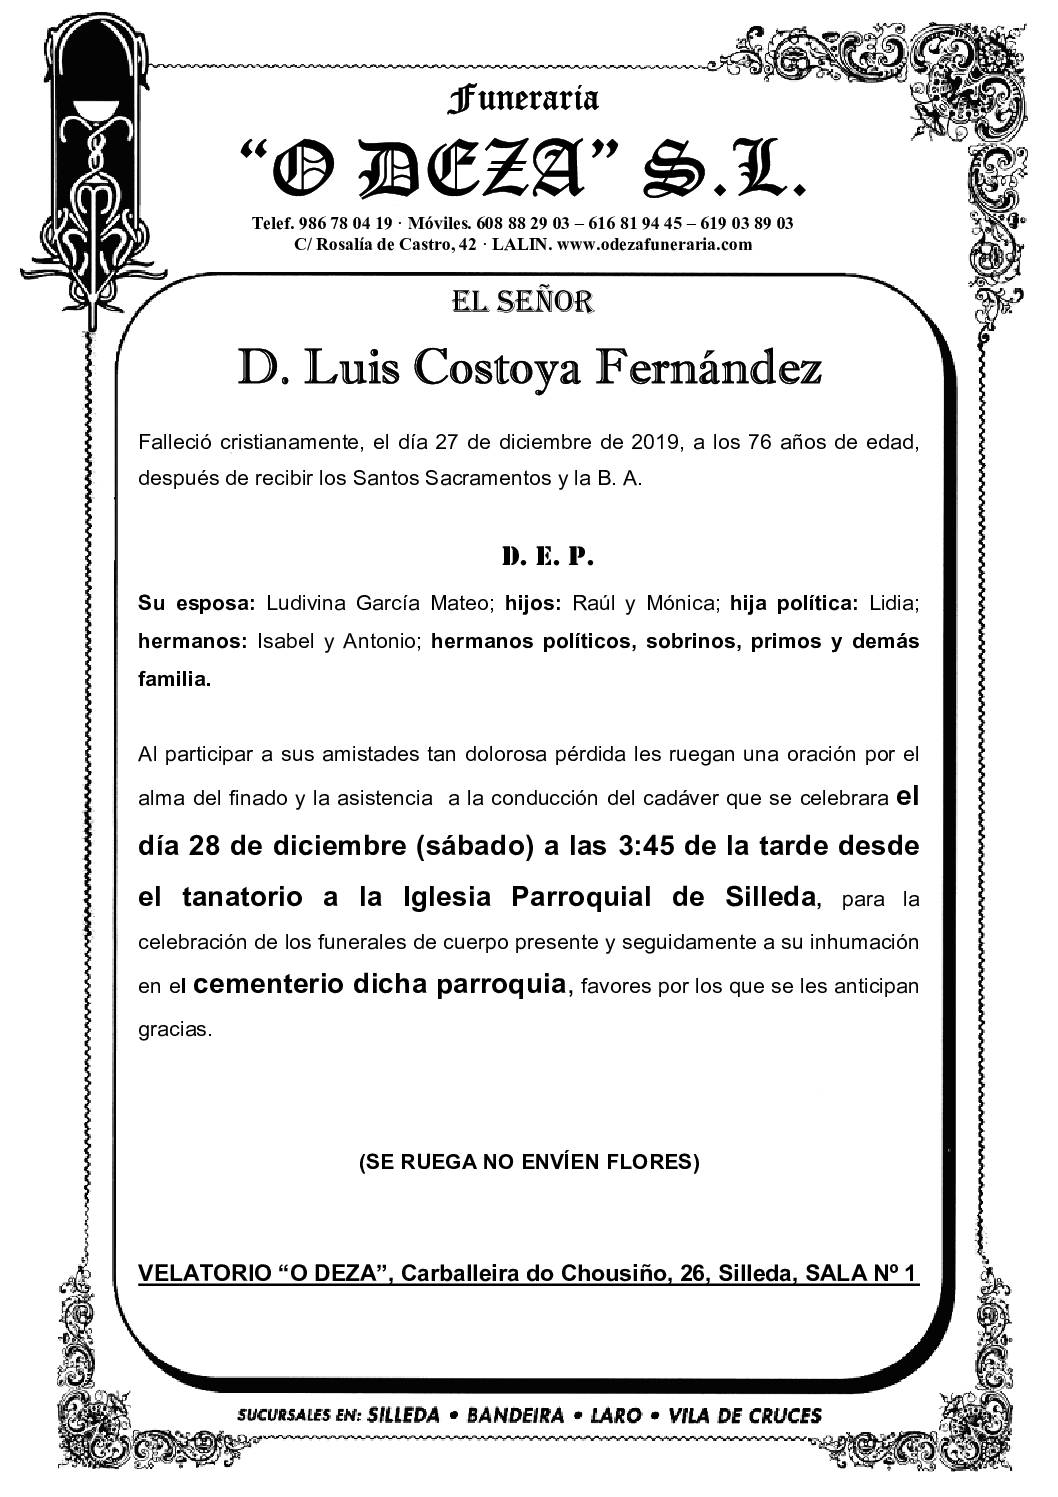 D. LUIS COSTOYA FERNÁNDEZ